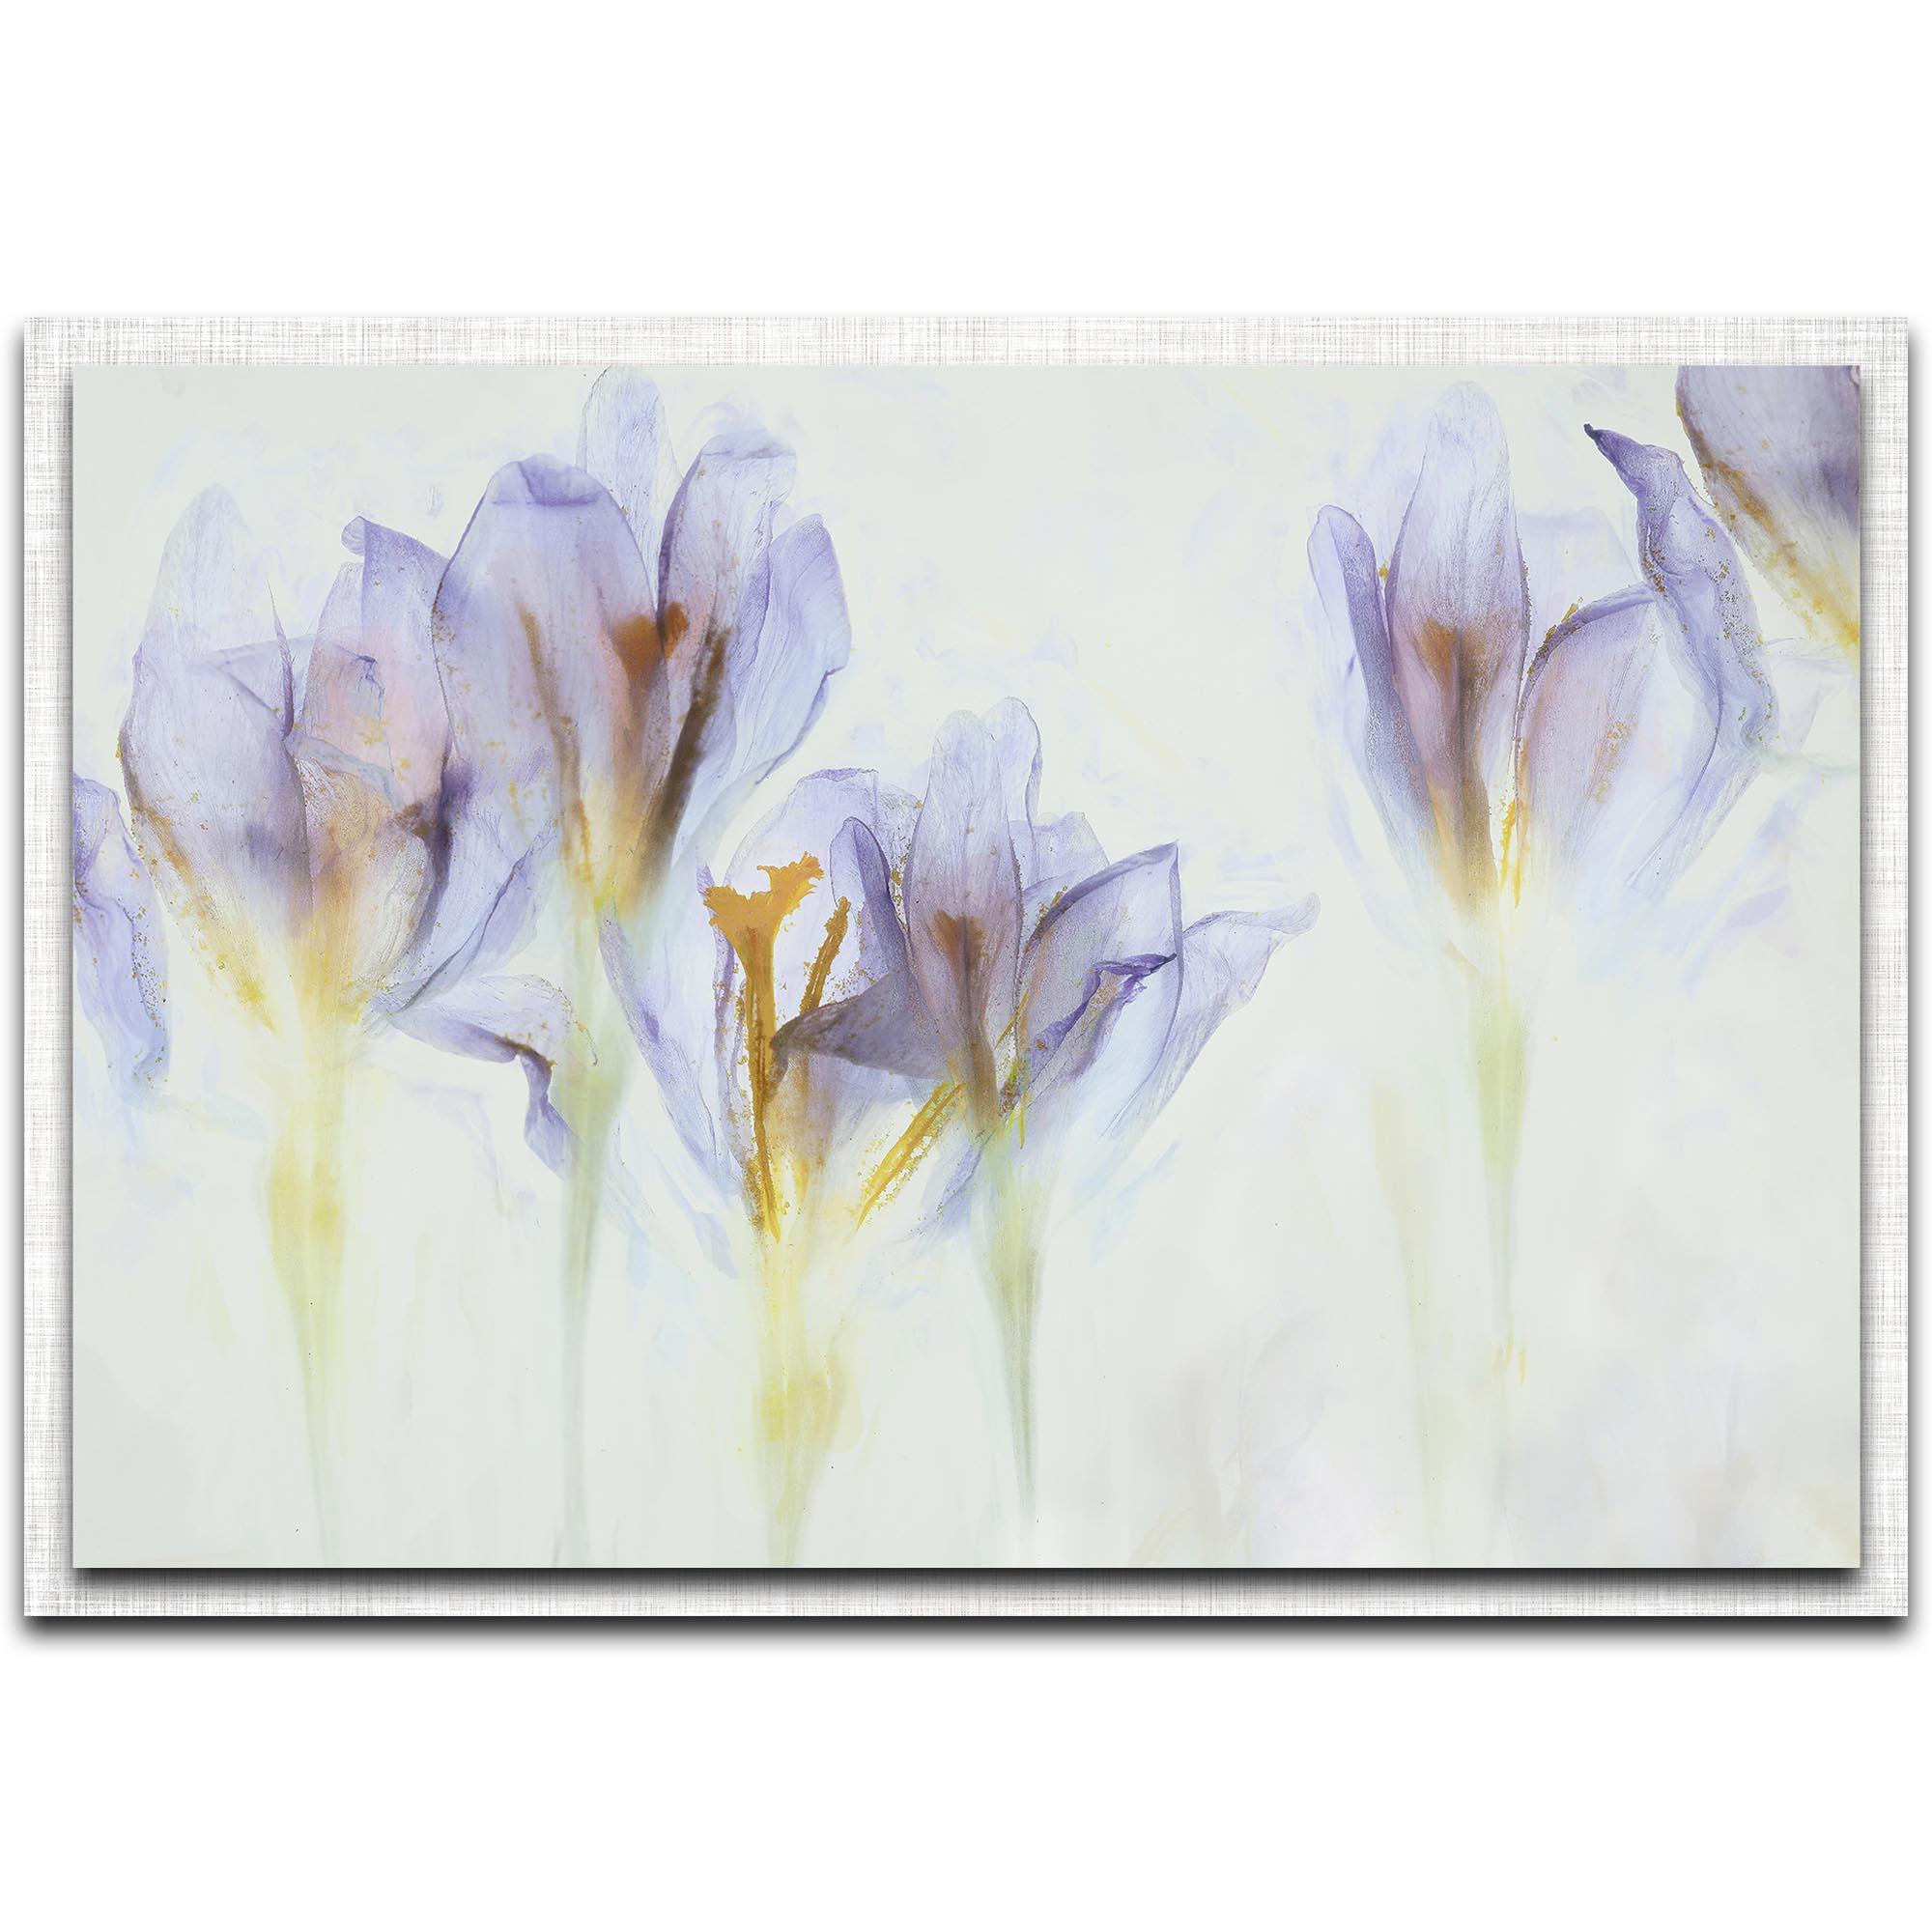 Nel Talen 'Spring' 32in x 22in Modern Farmhouse Floral on Metal